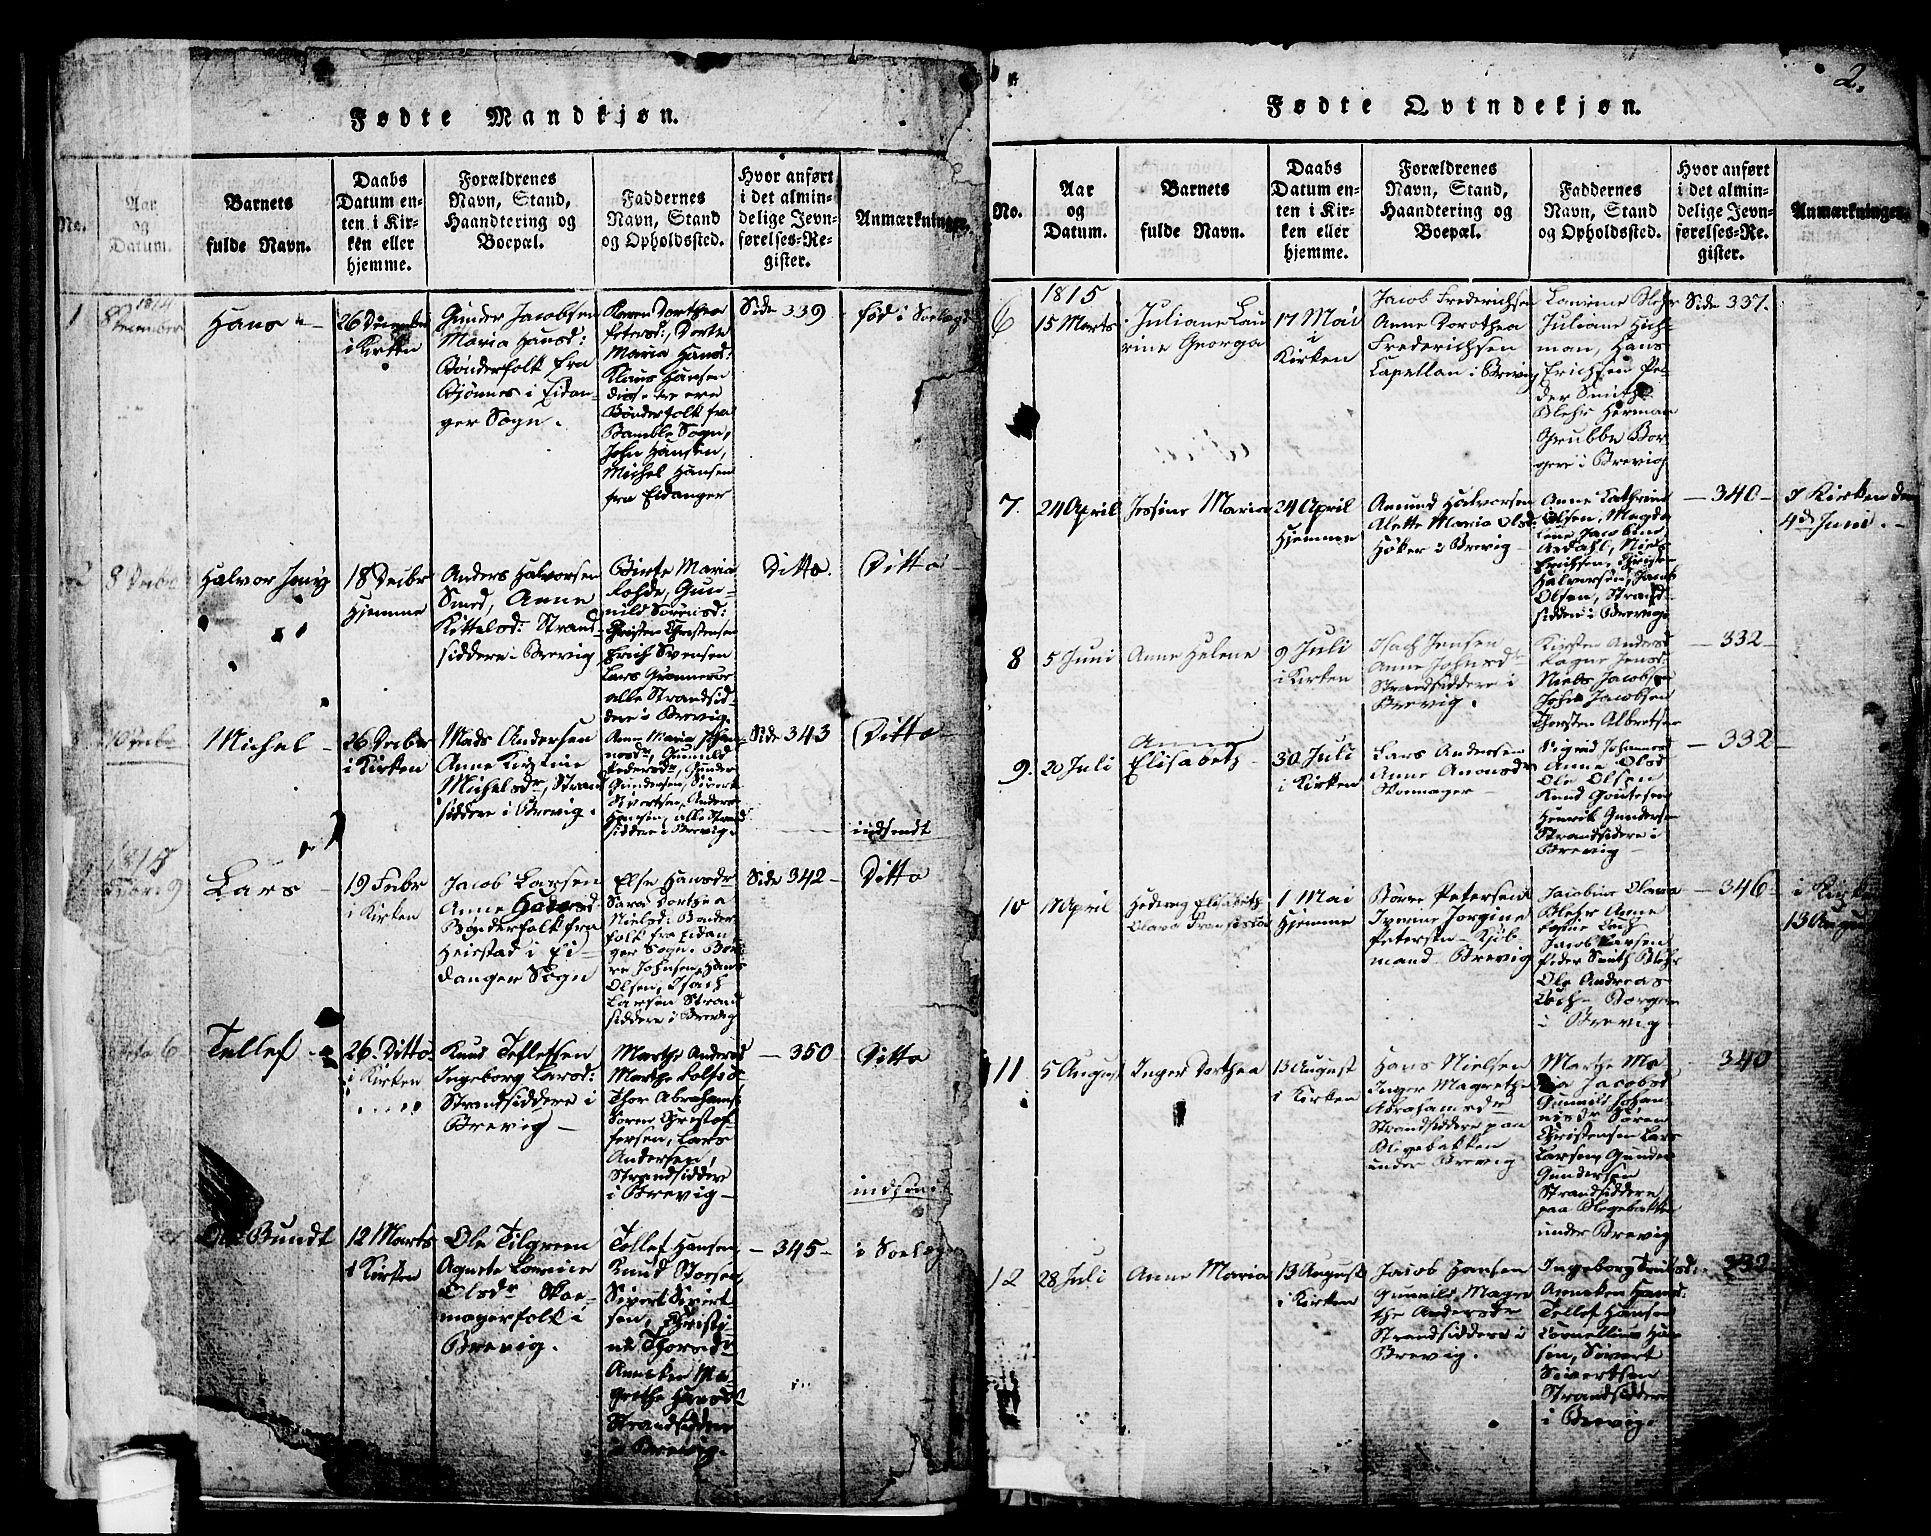 SAKO, Brevik kirkebøker, G/Ga/L0001: Klokkerbok nr. 1, 1814-1845, s. 2